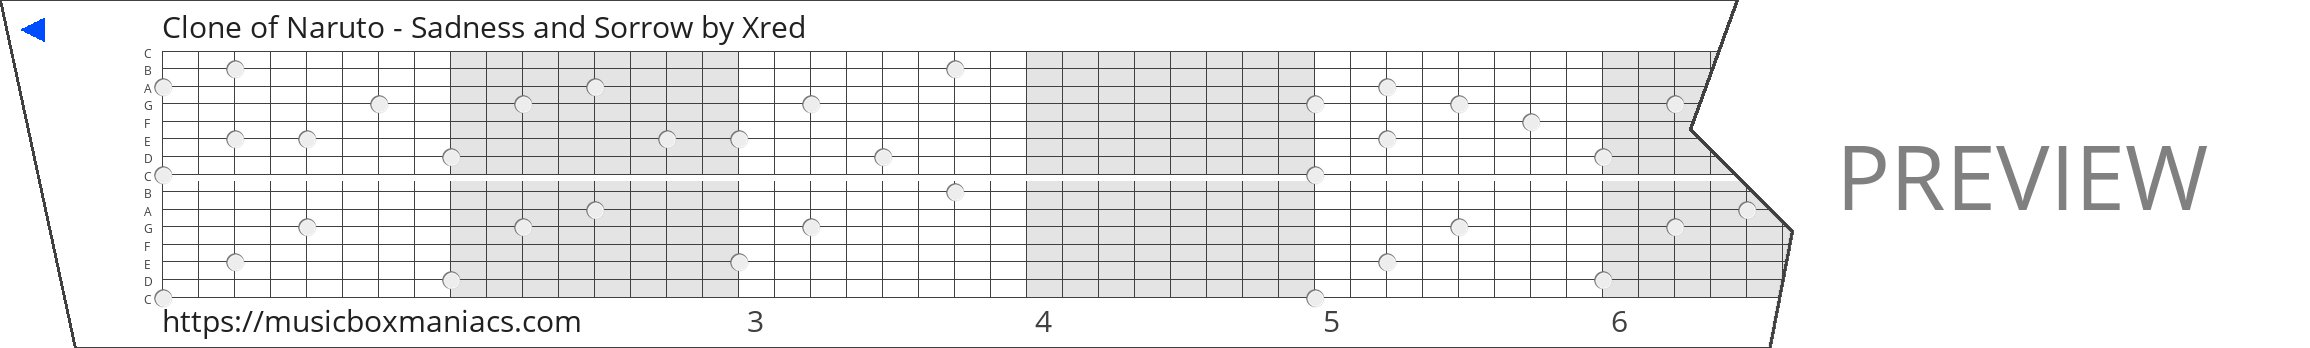 Clone of Naruto - Sadness and Sorrow 15 note music box paper strip